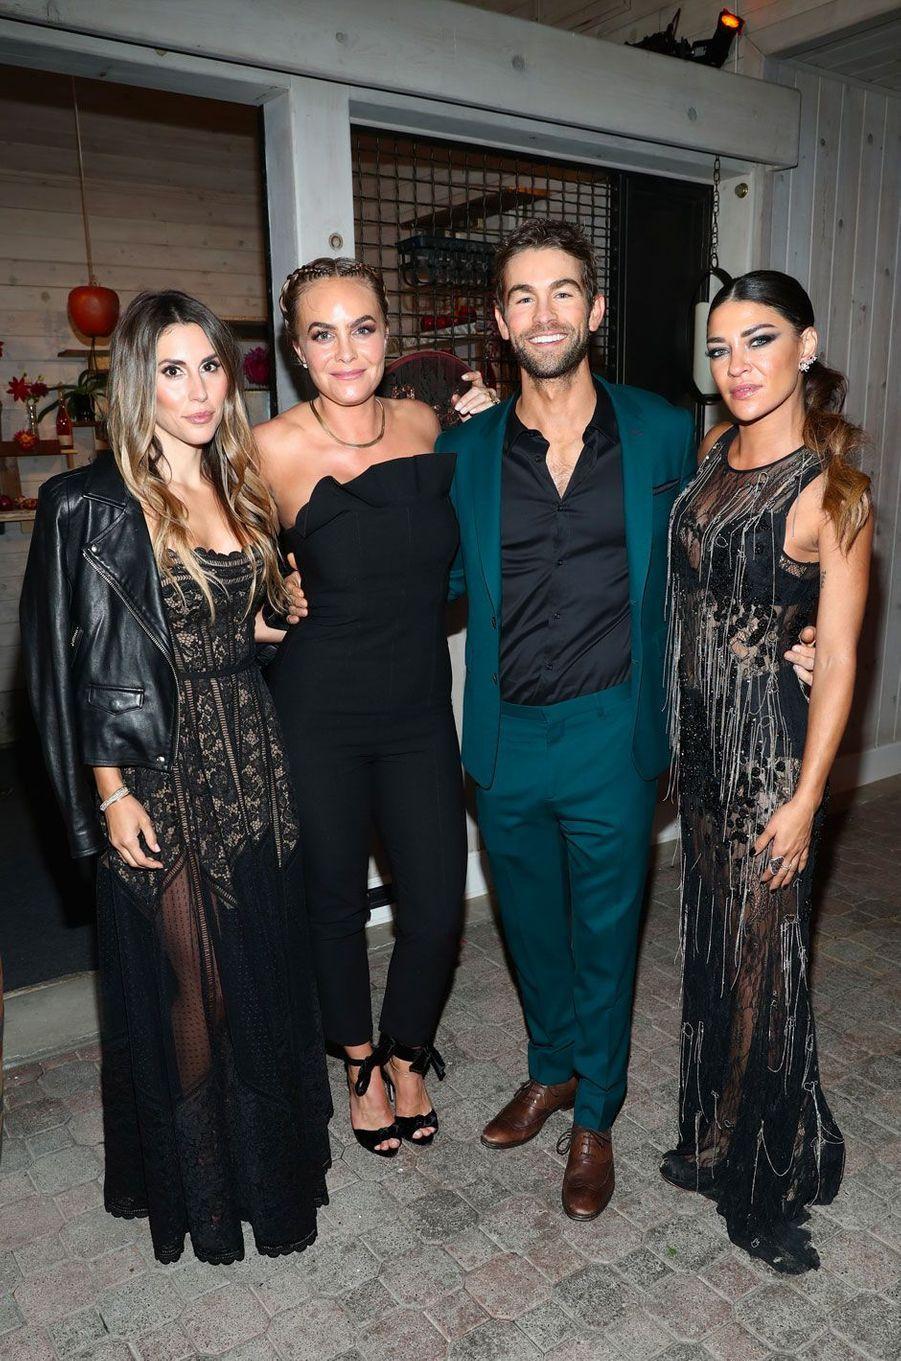 Alisia Leibel, Nikki Erwin, Chace Crawford et Jessica Szohr au gala de la Leonardo DiCaprio Foundadtion, le 15 septembre 2018 à Santa Rosa